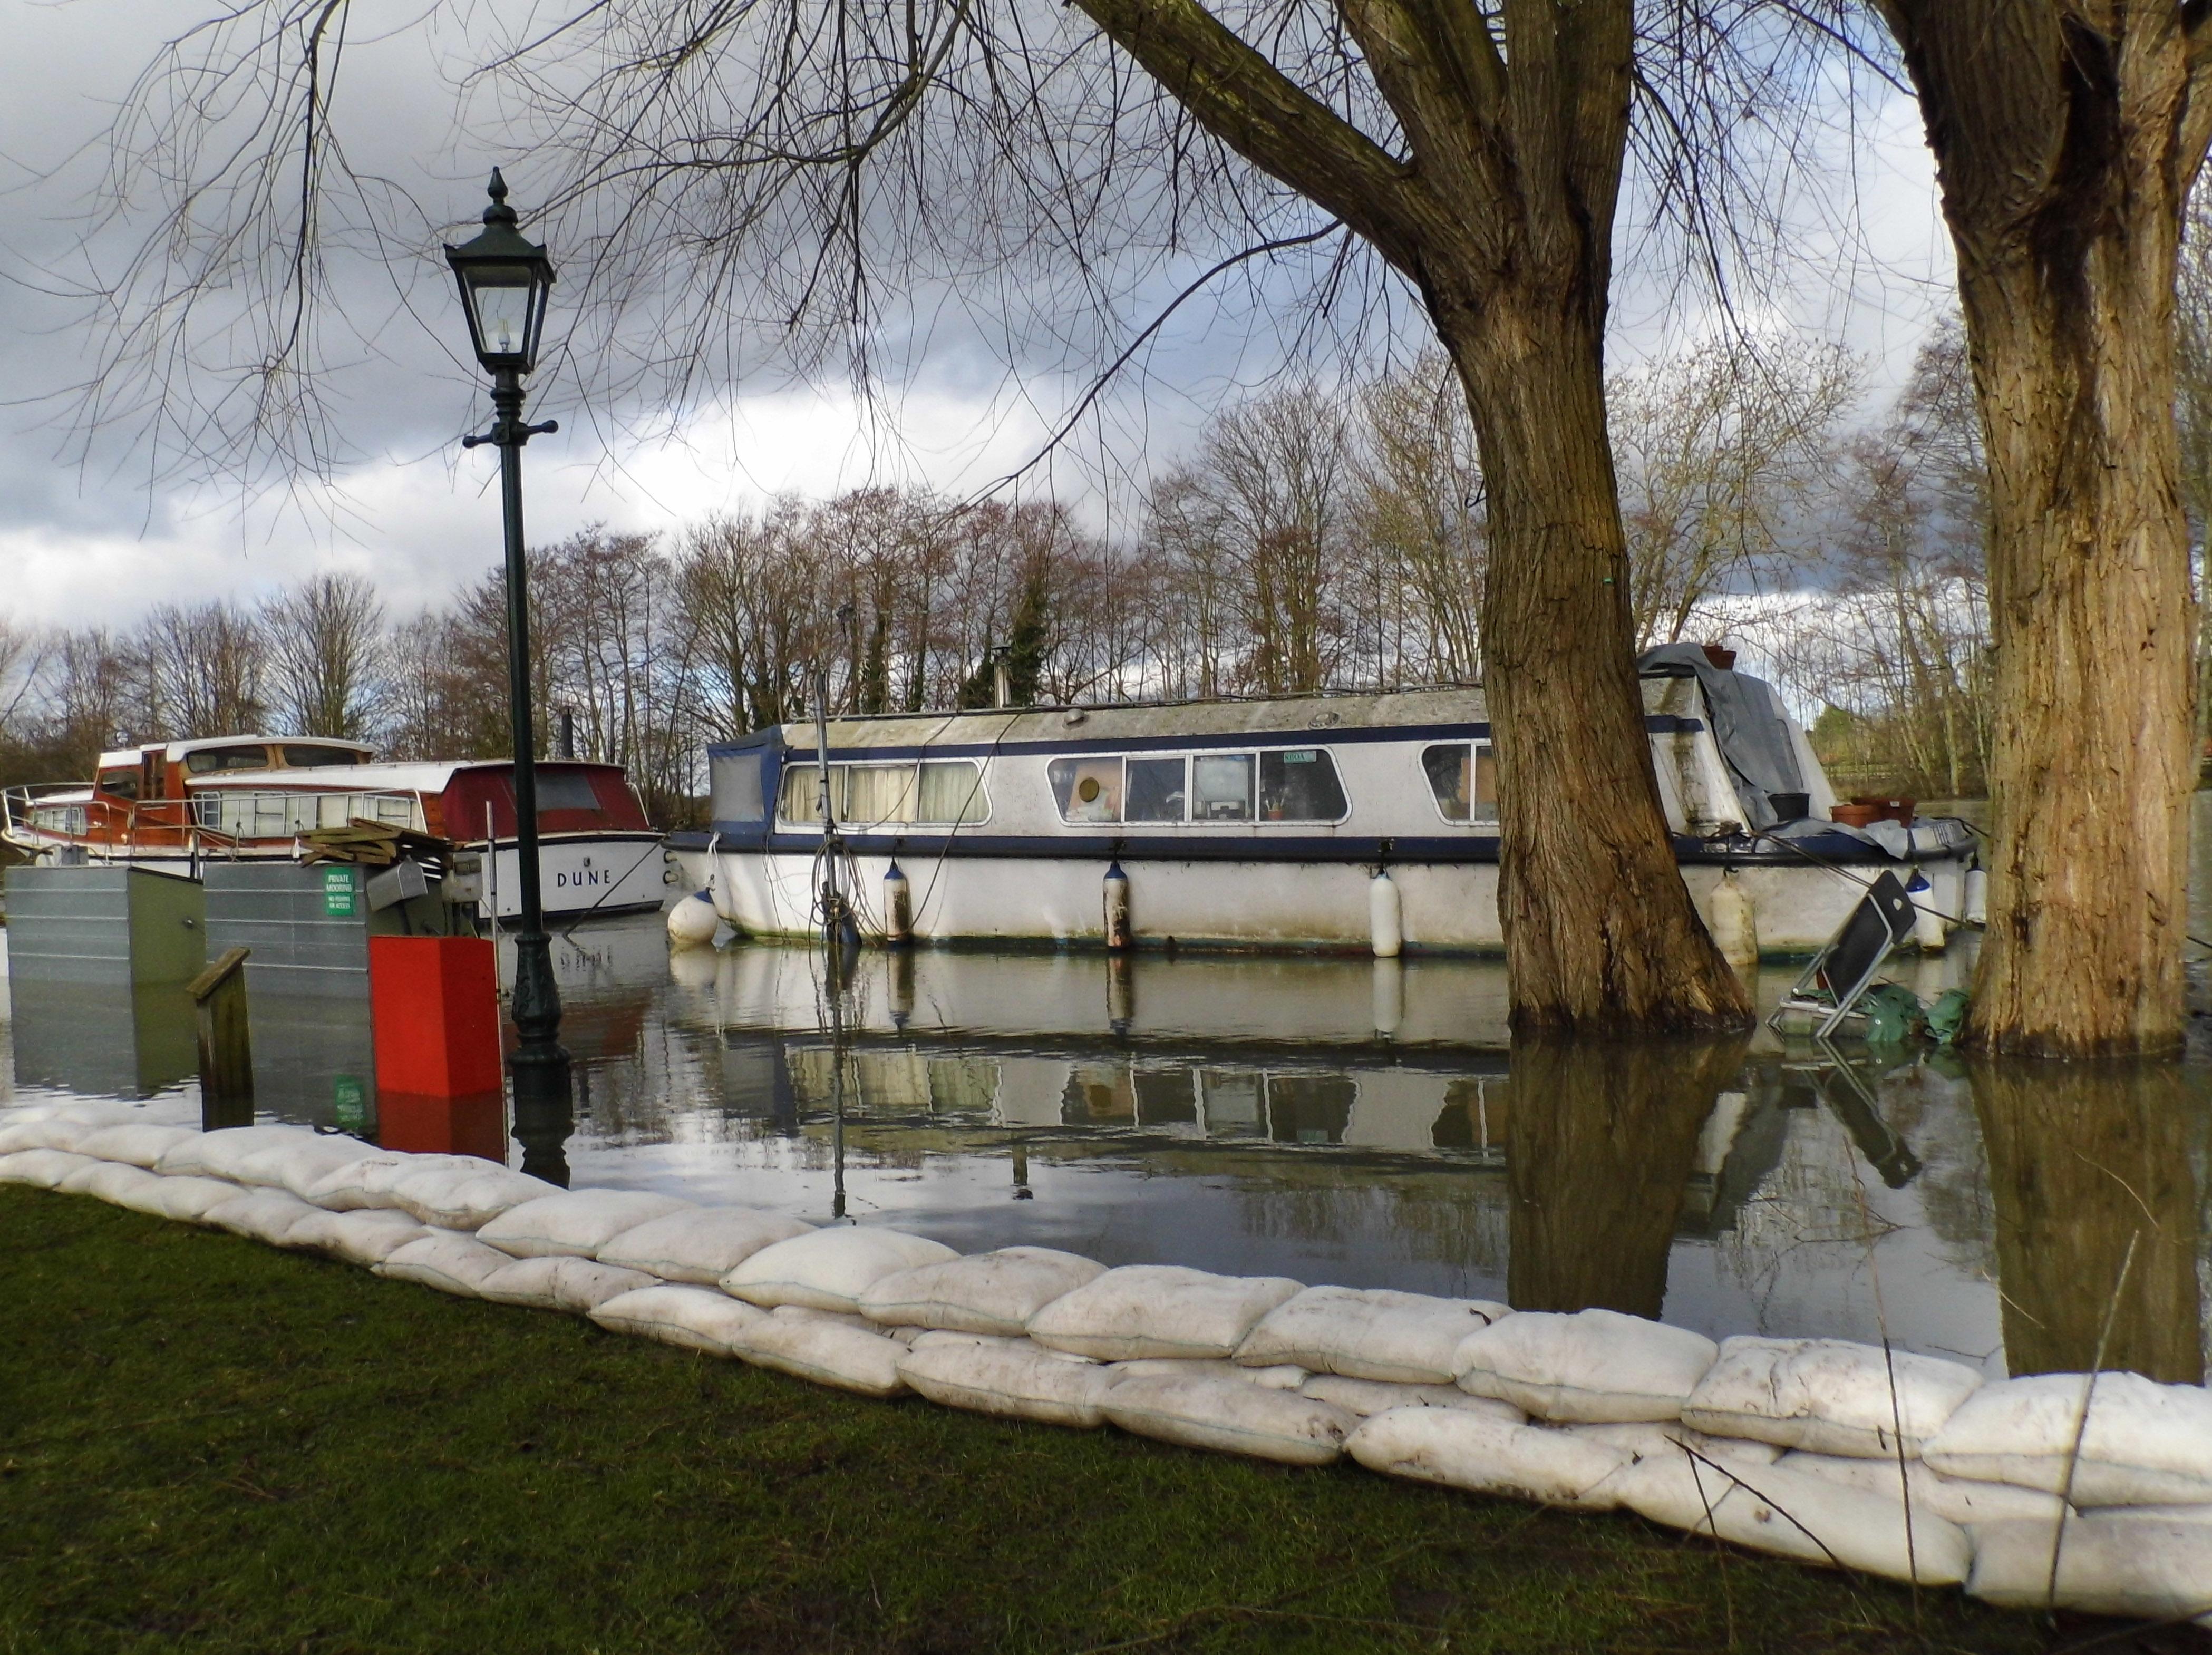 Floodsax-save-caravan-park-in-Windsor